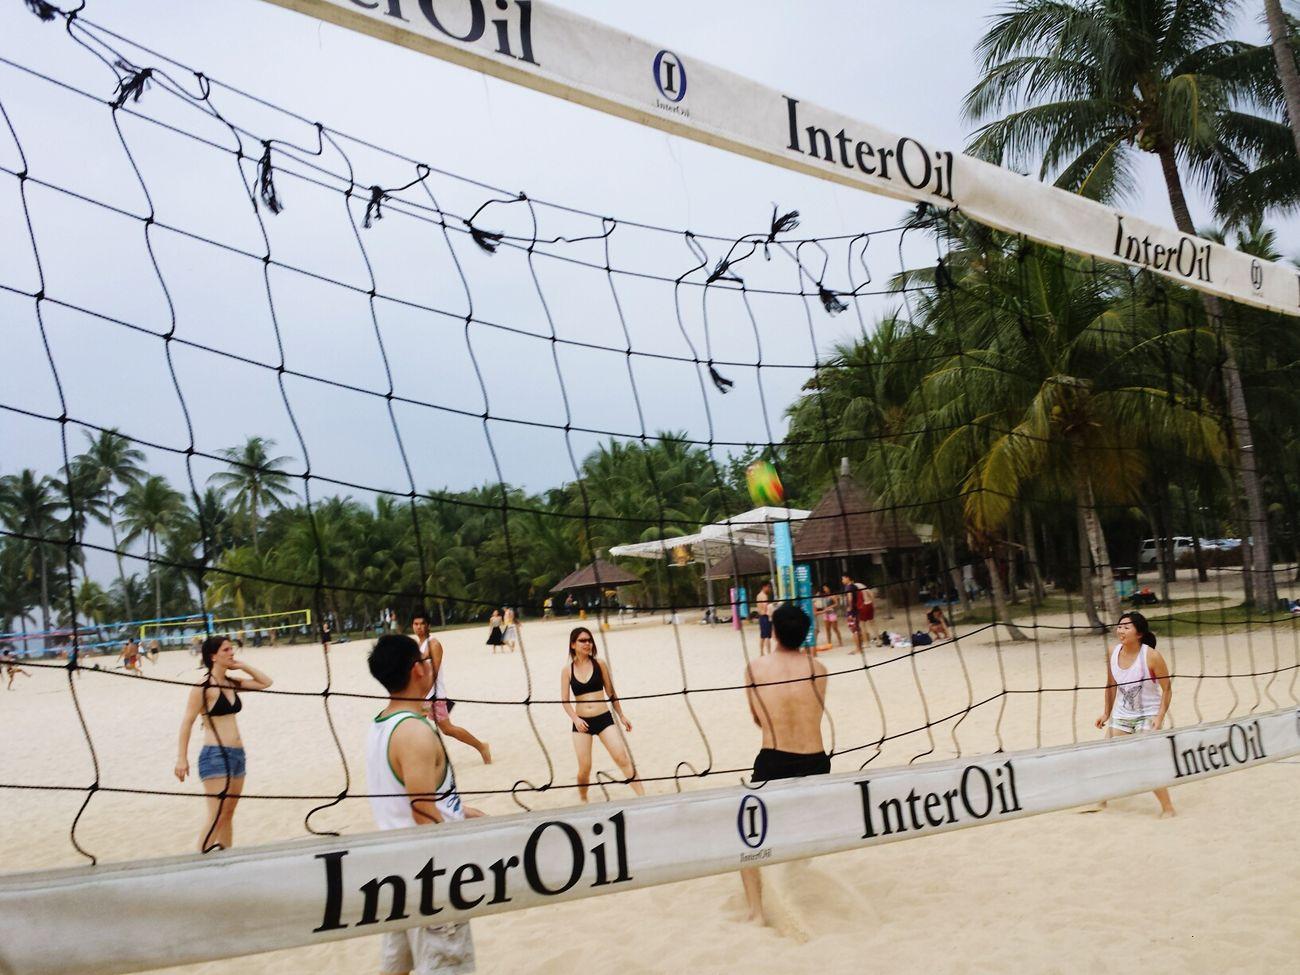 beach volleyball. sentosa Singapore